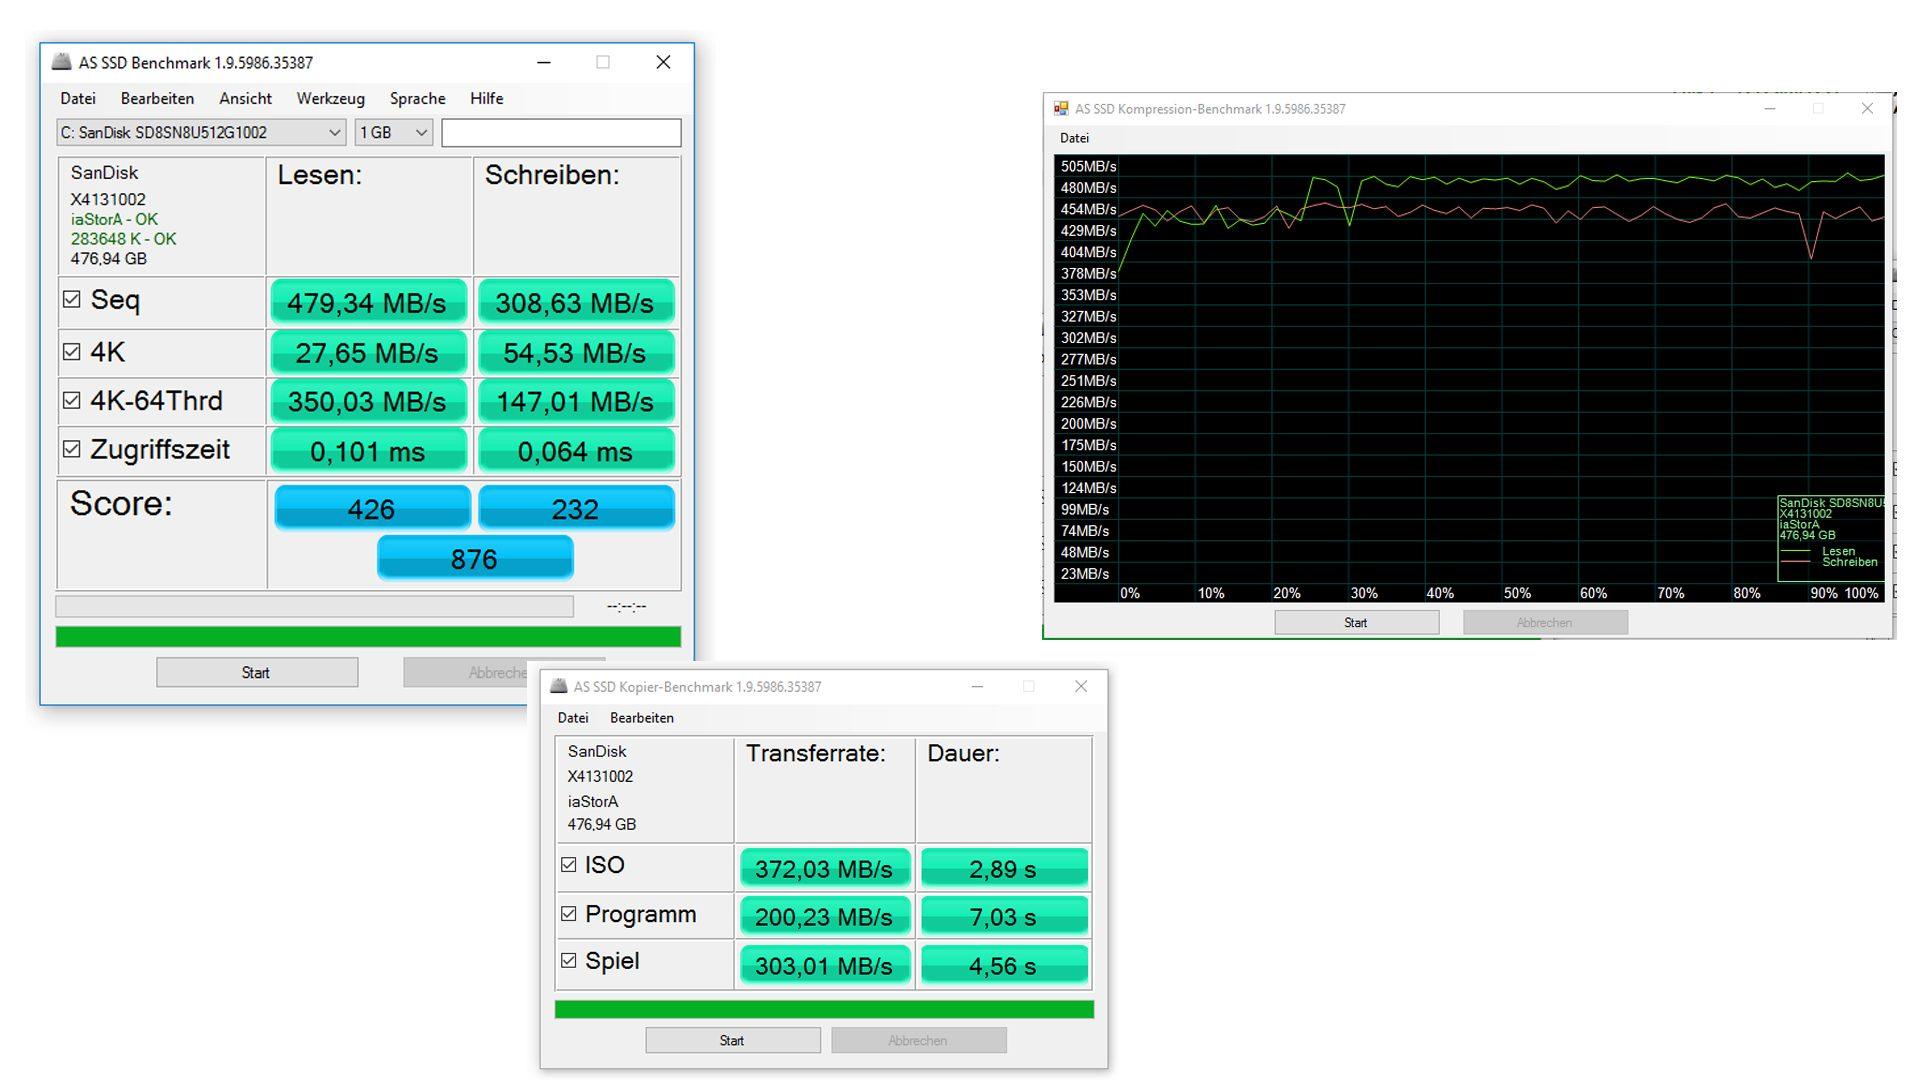 Asus-GL702VM-GC017T-Benchmark_3